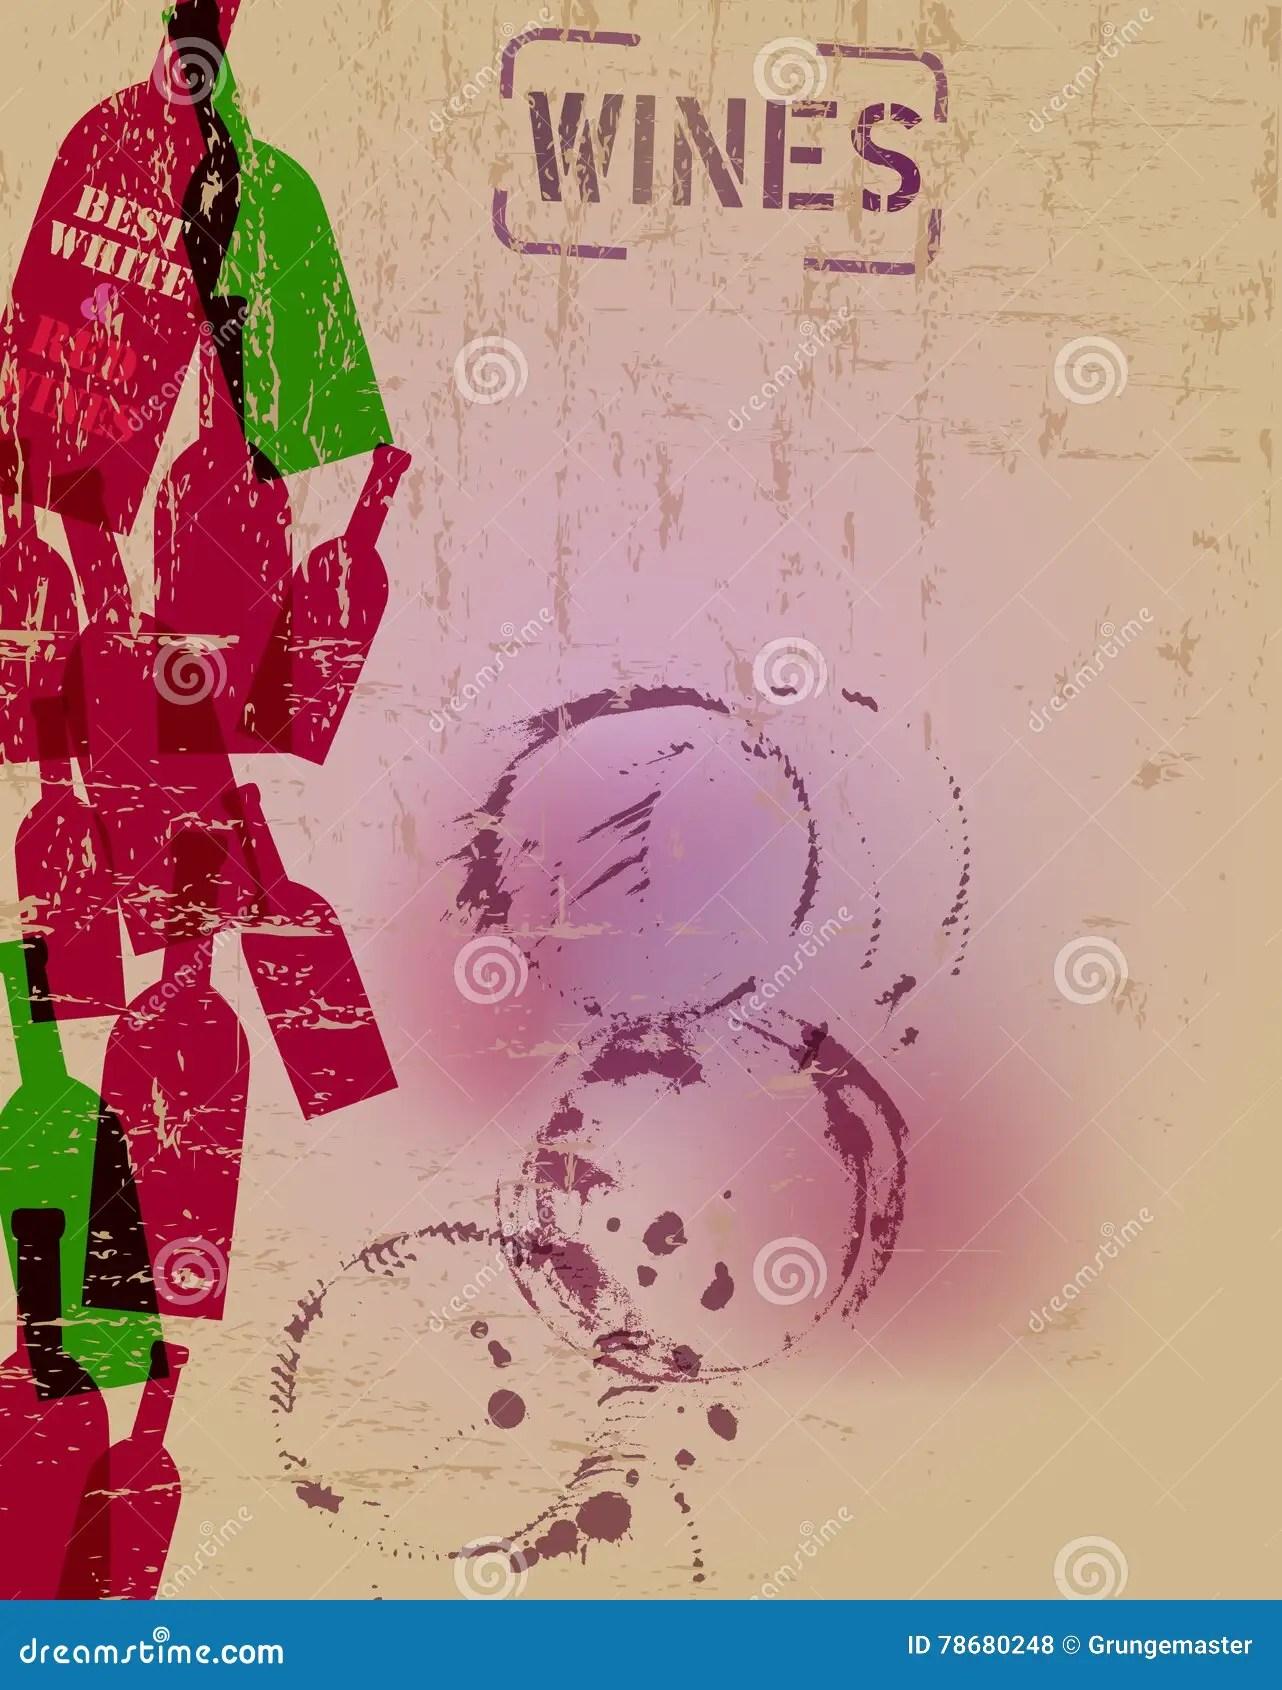 Wine List Menu Design Template Stock Vector - Illustration of